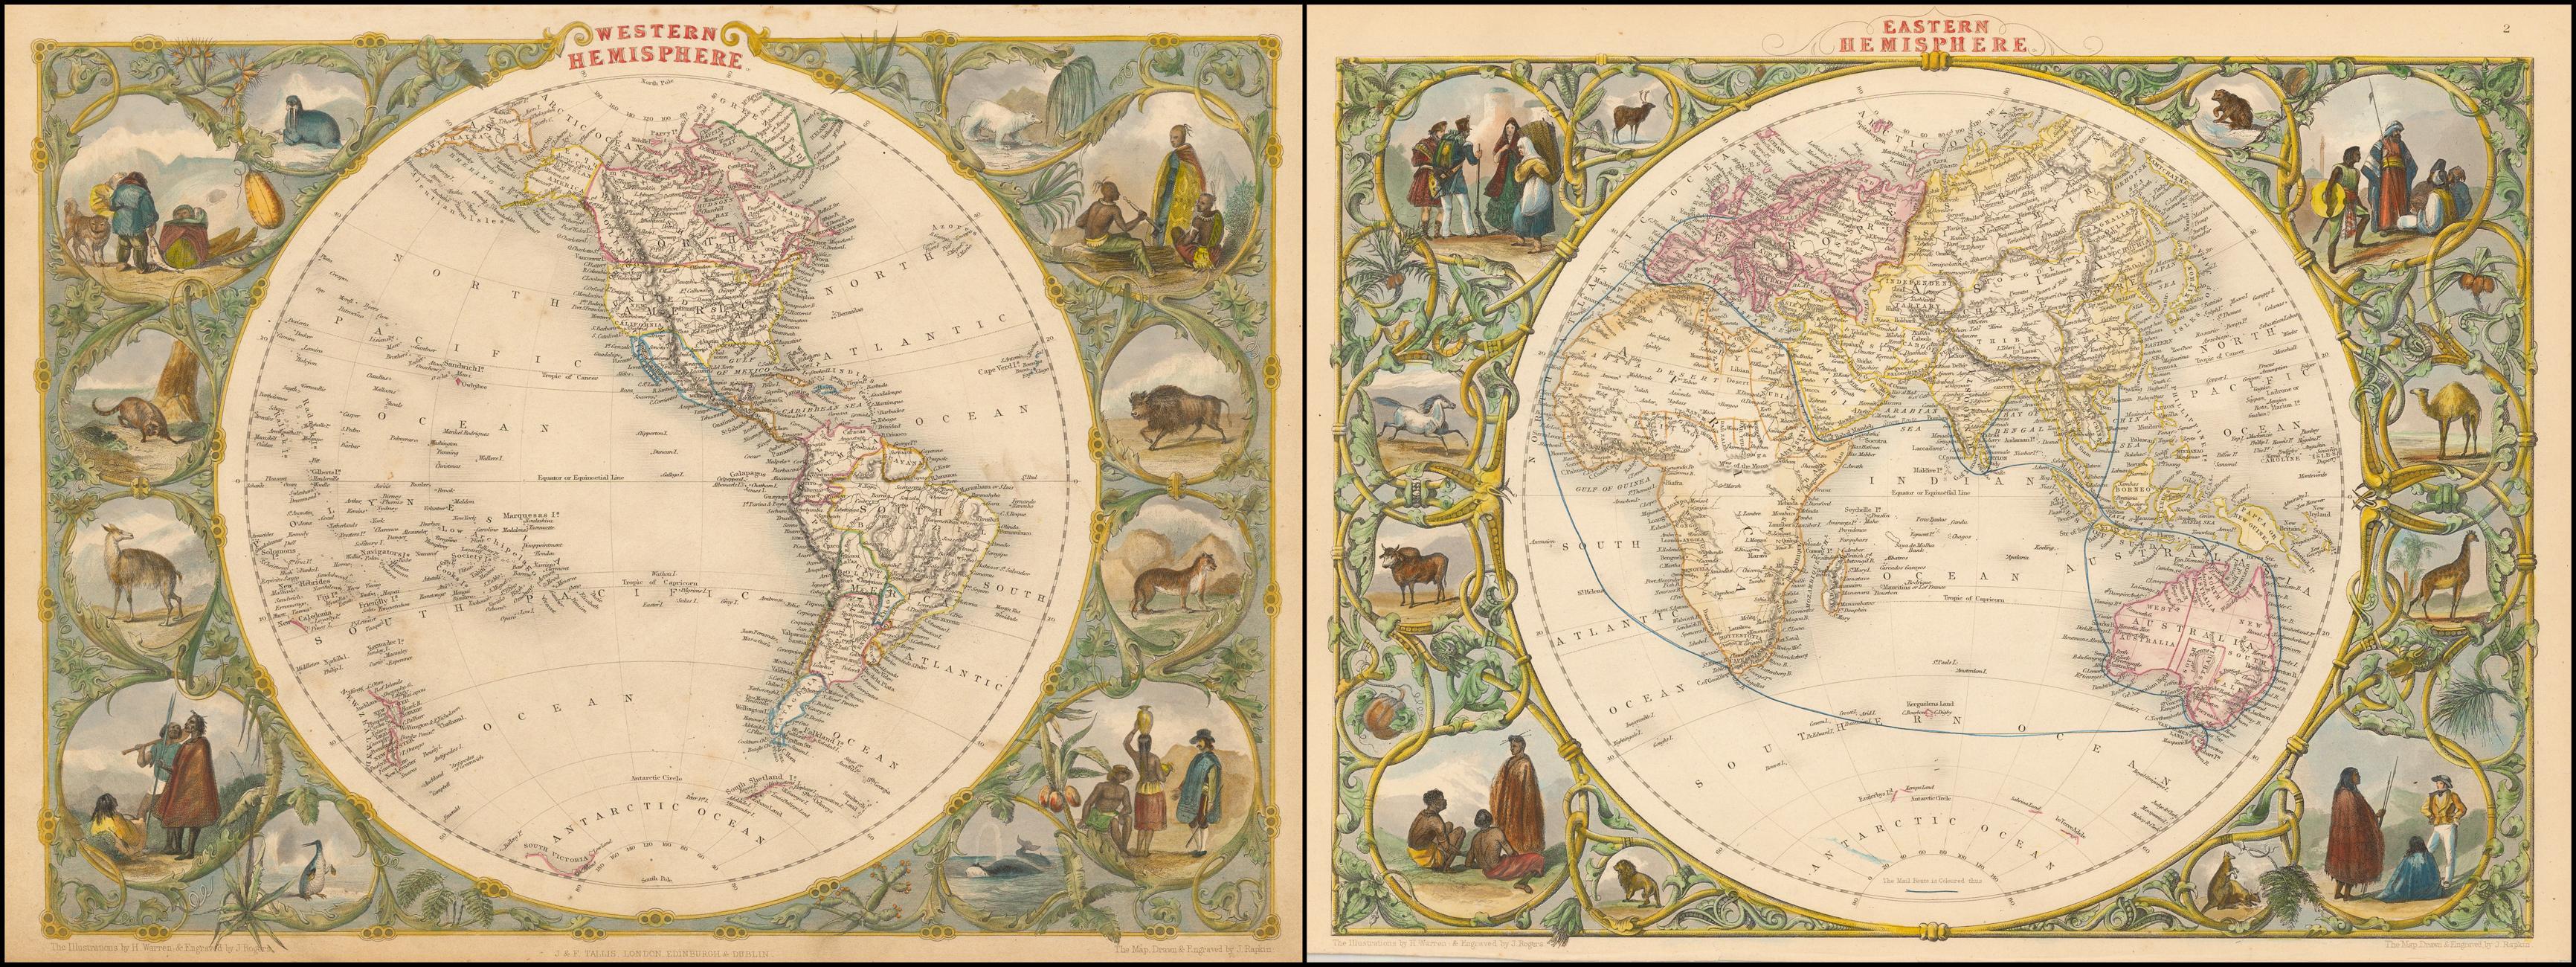 Western Hemisphere [and] Eastern Hemisphere - Barry Lawrence ...